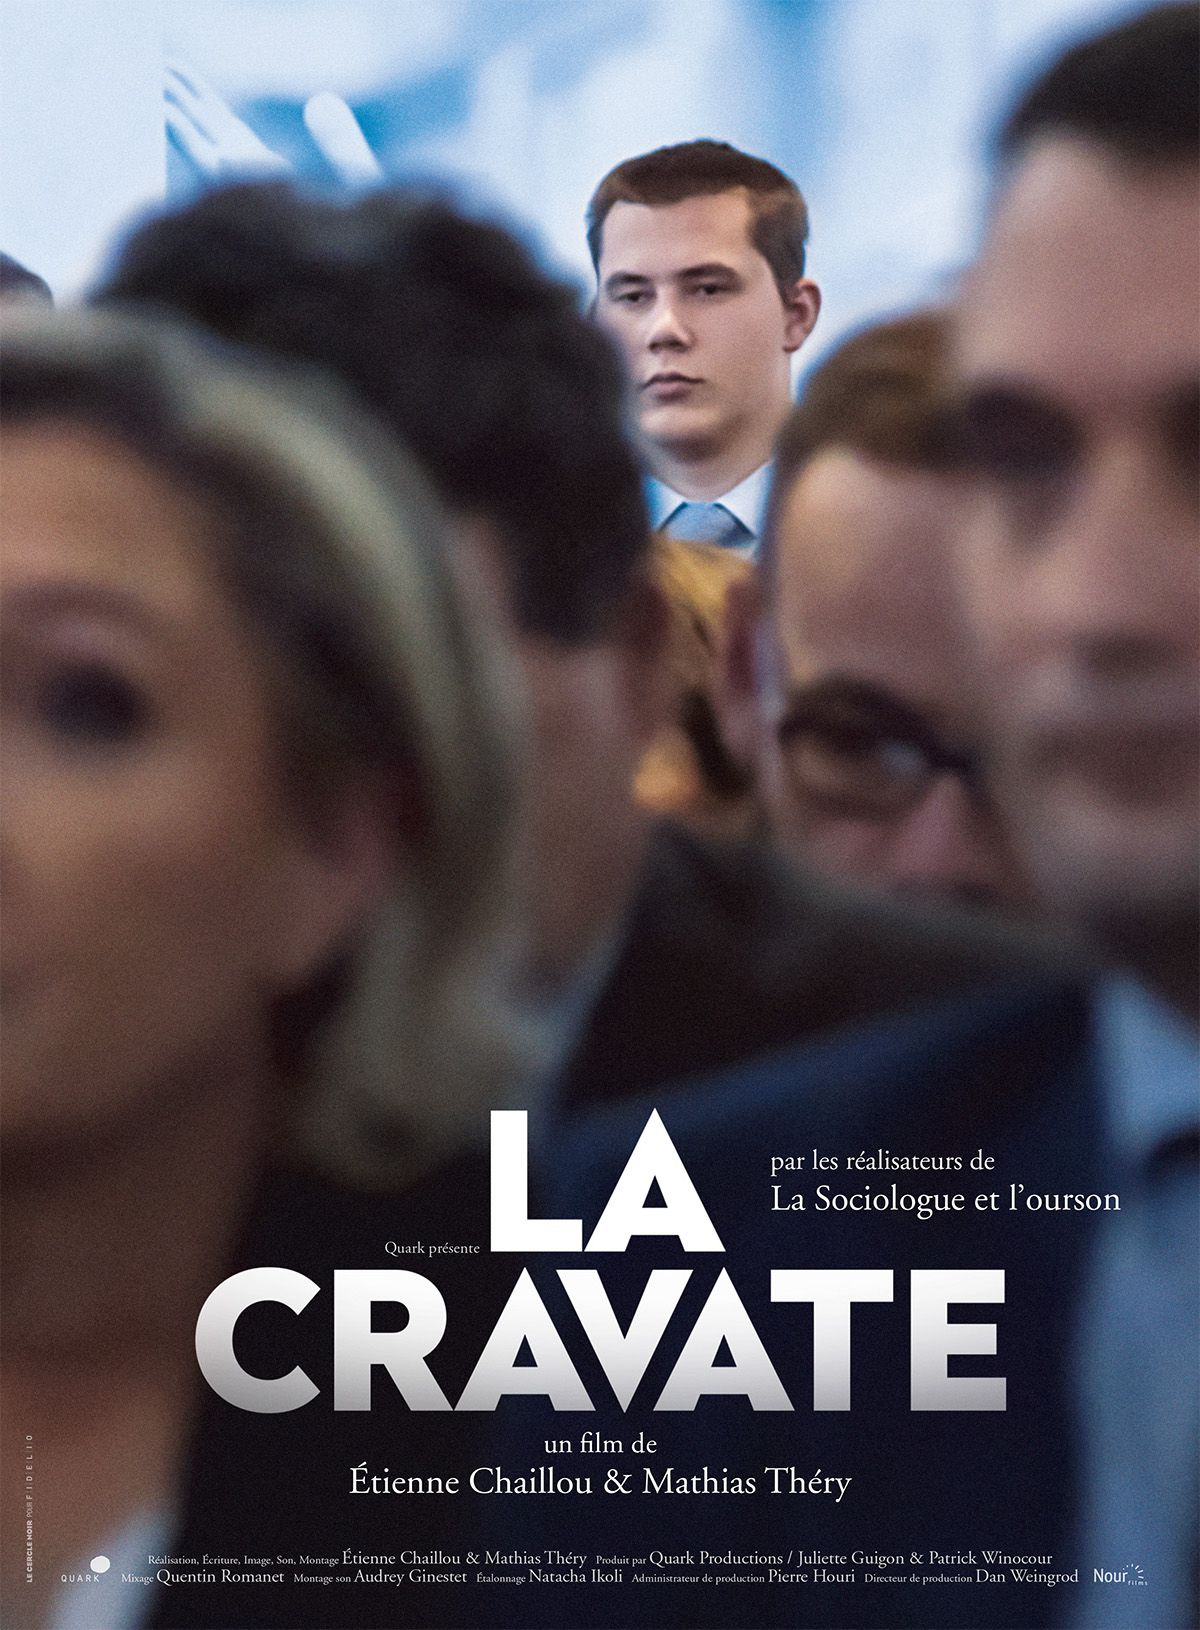 La Cravate - Documentaire (2020)